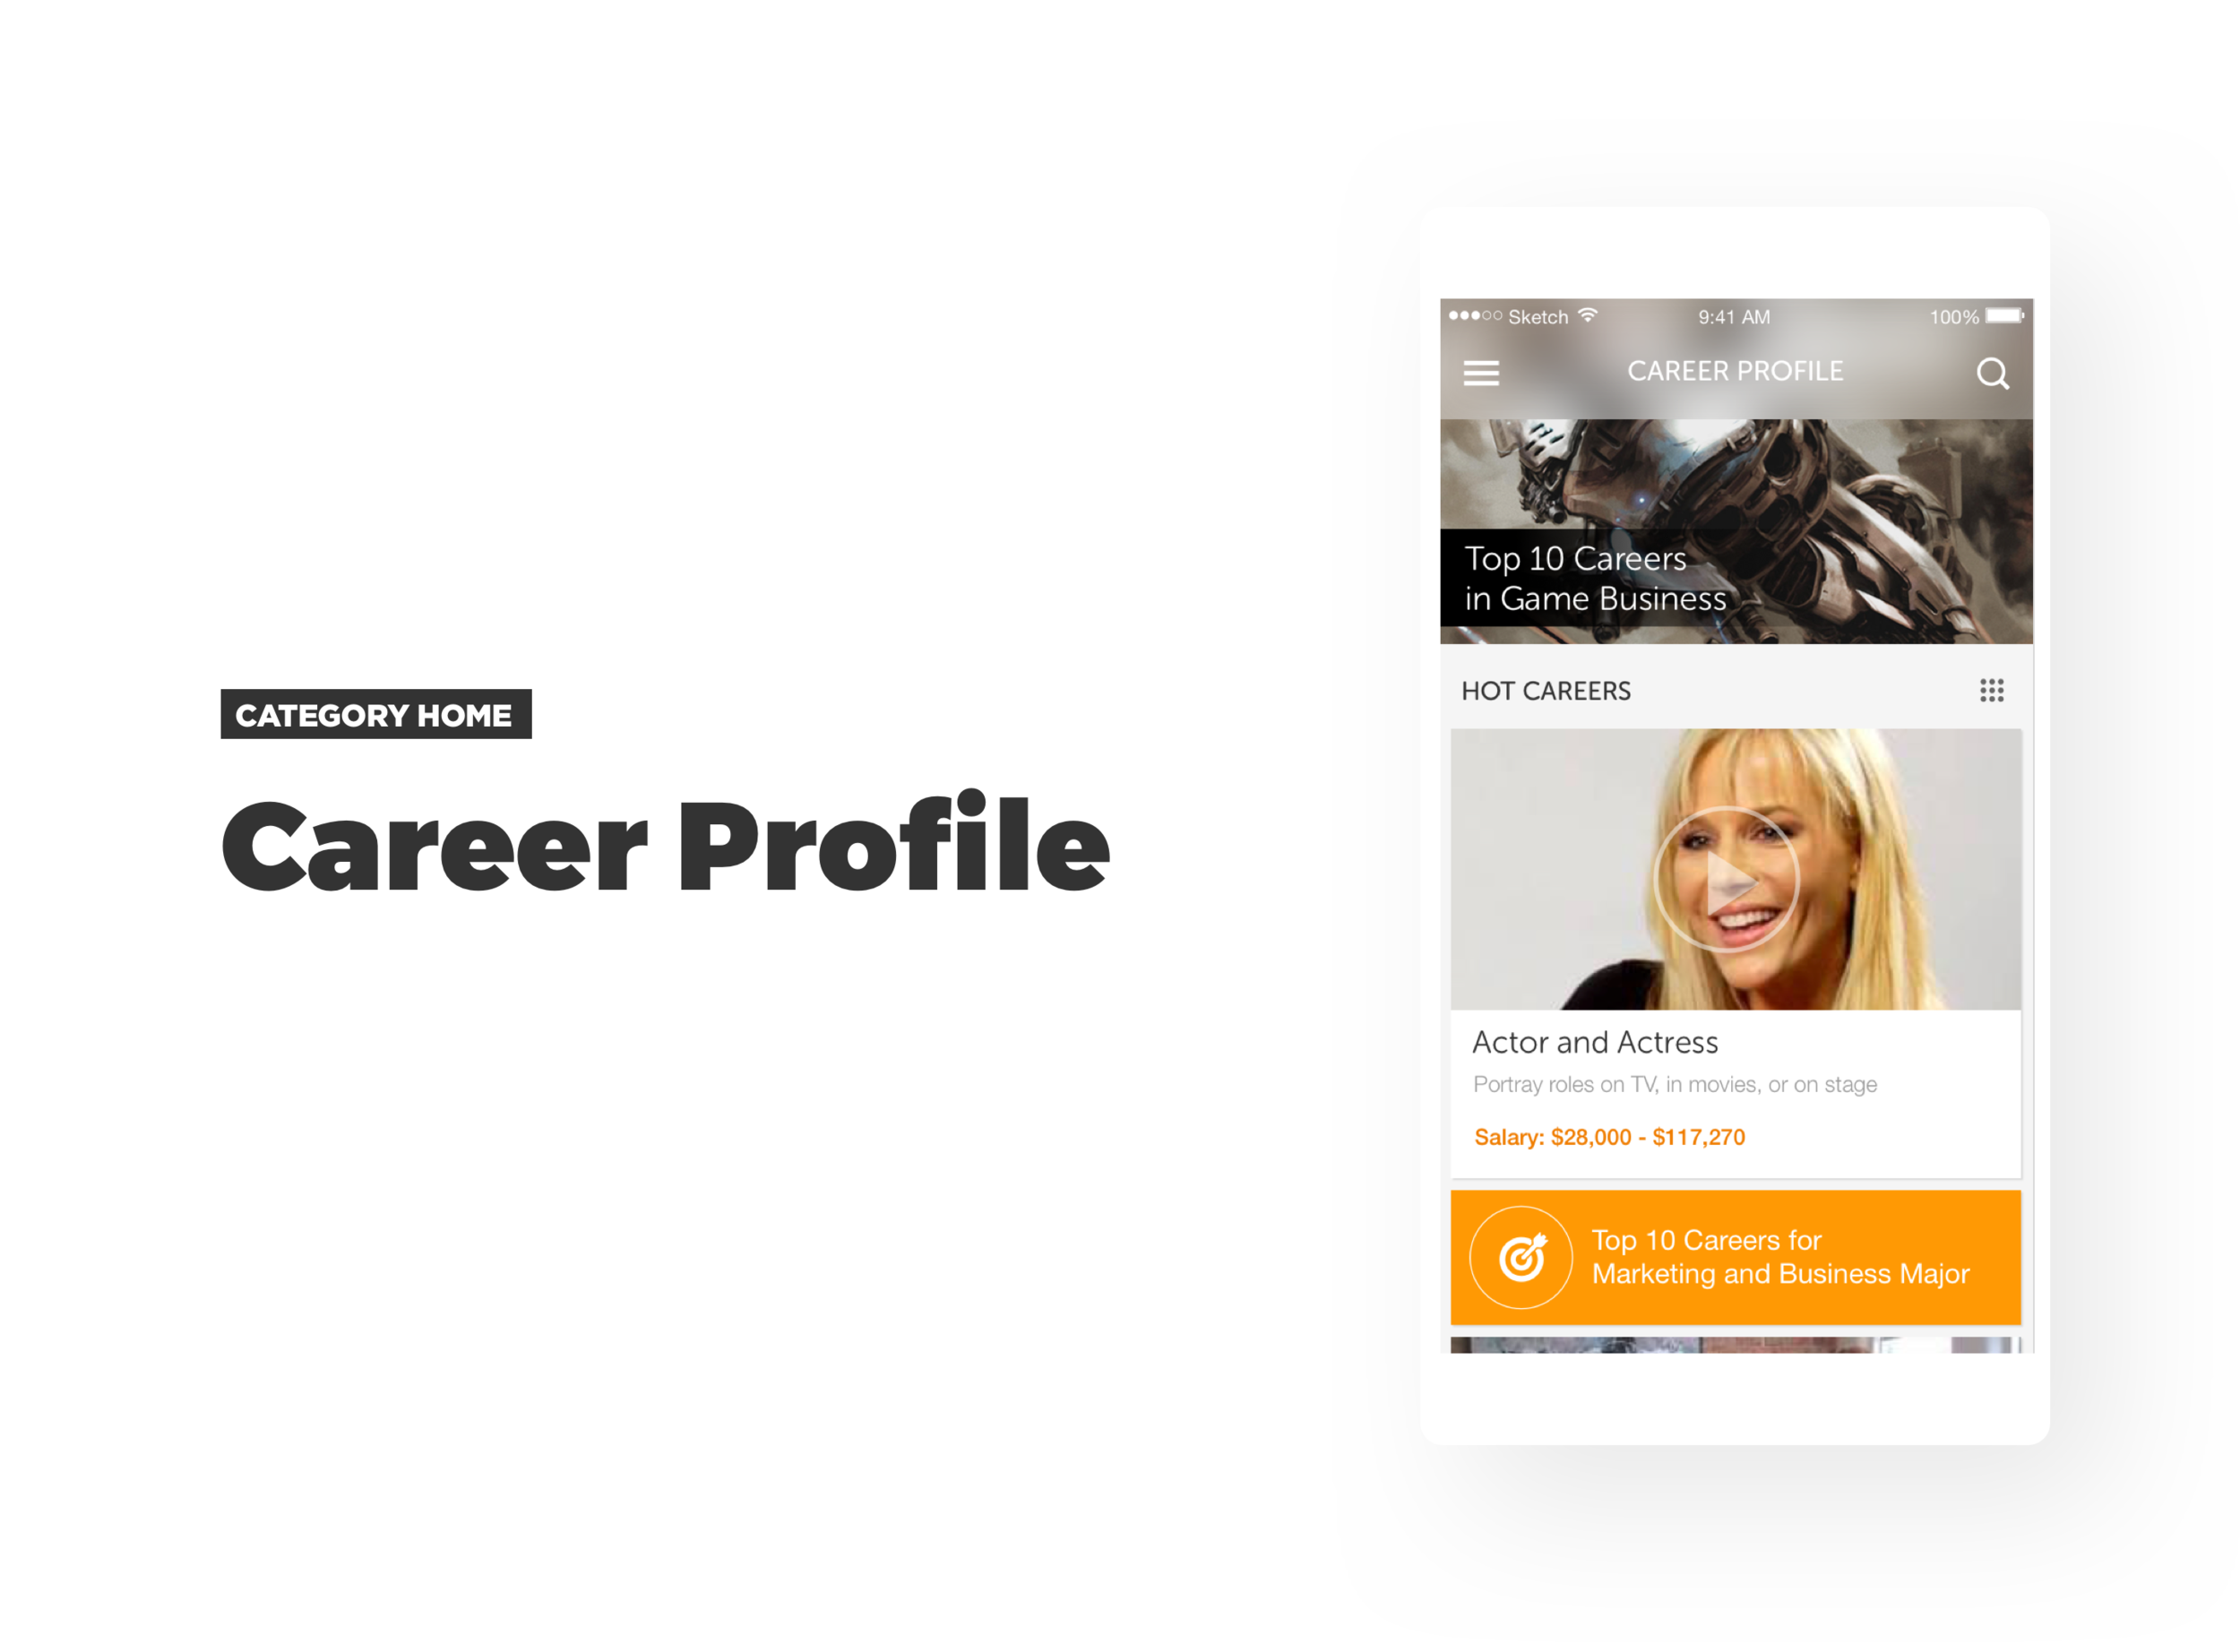 career-app-21@2x.png